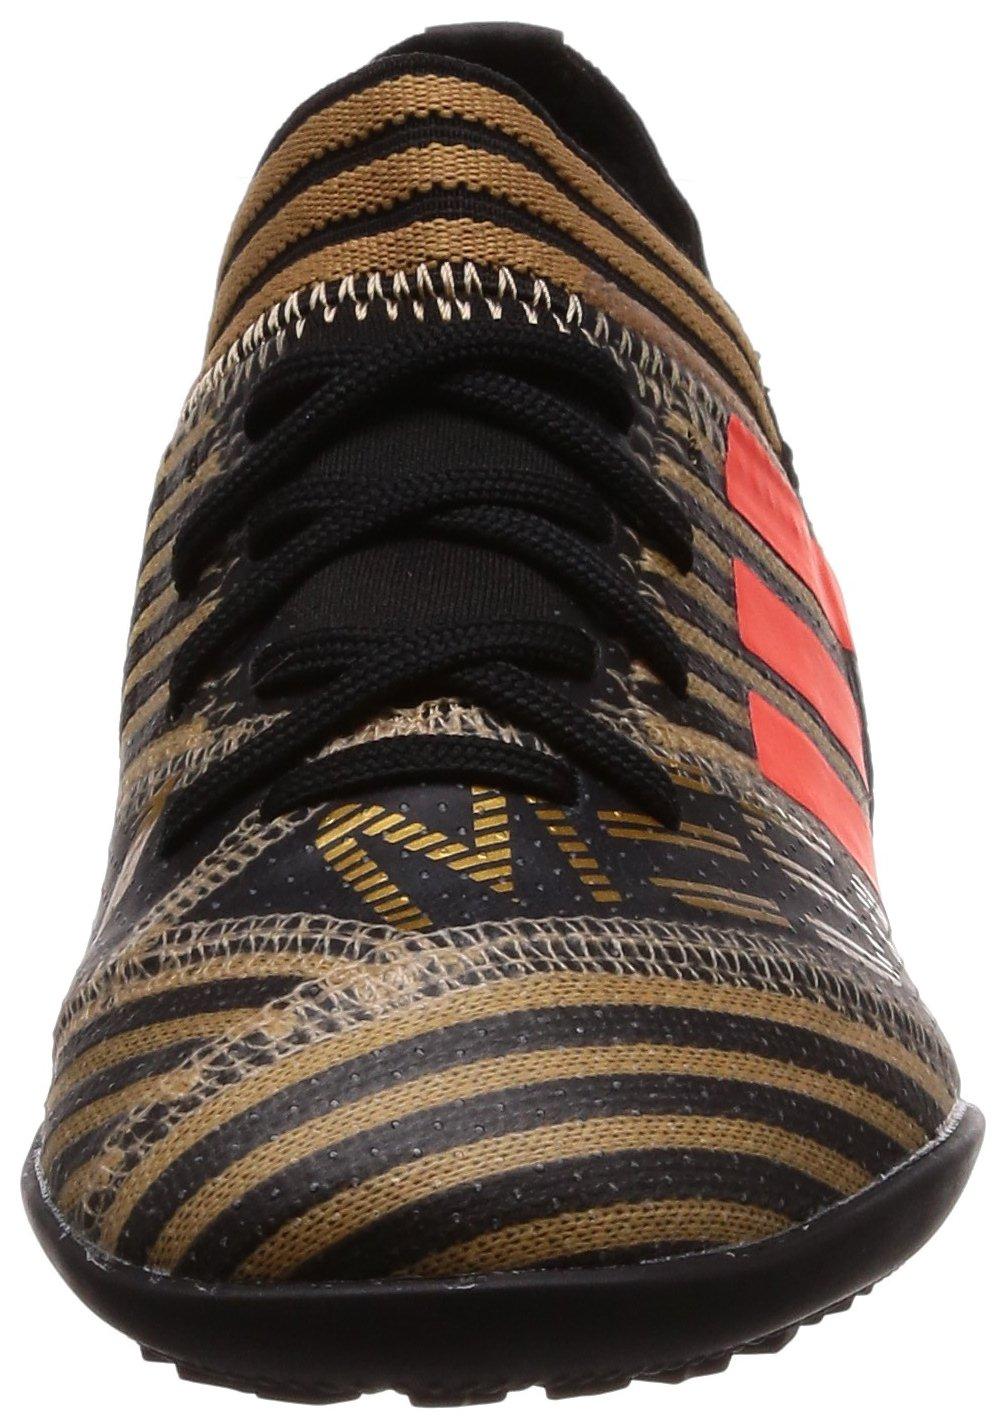 adidas Nemeziz Messi 19995 Tango Noir Mixte TF, Chaussures de